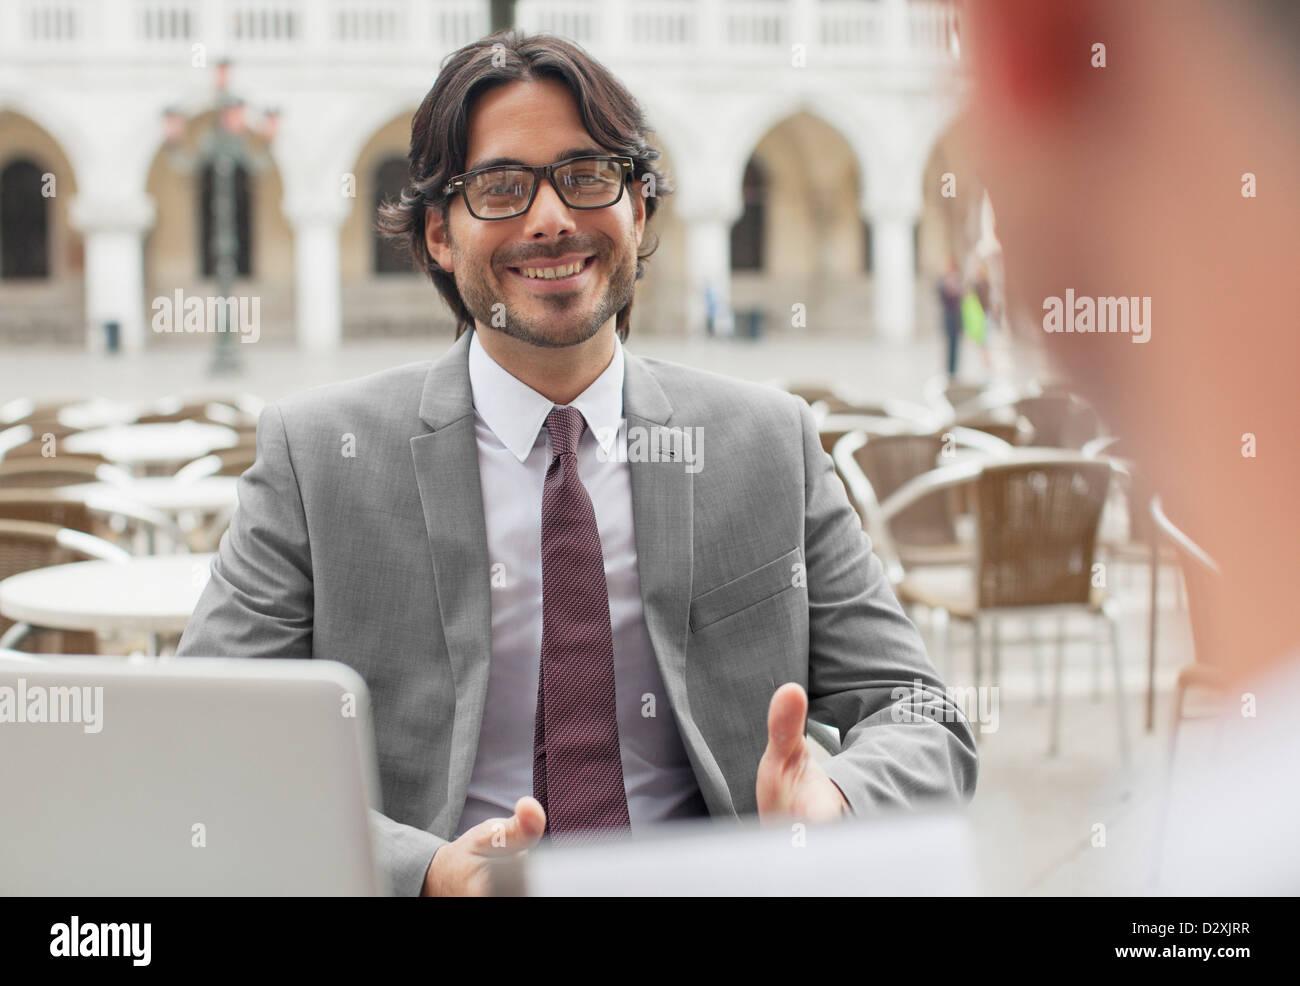 Smiling businessman talking to co-worker at sidewalk cafe - Stock Image